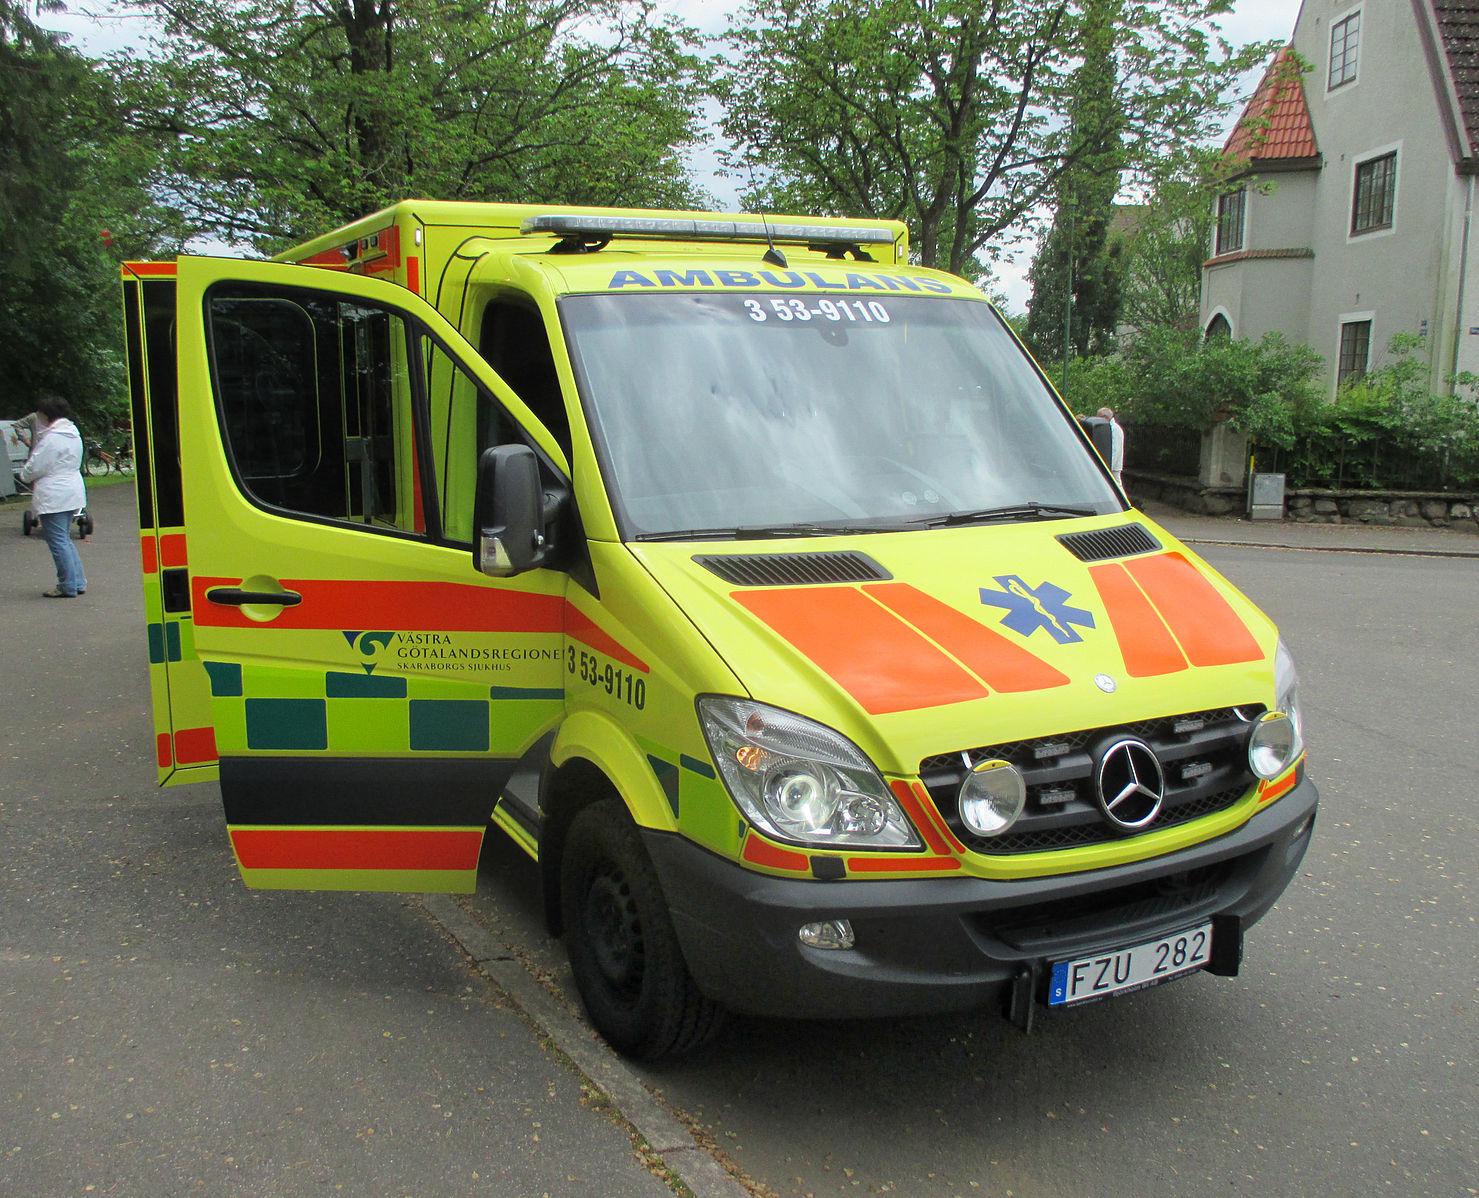 Svensk ambulanse fra Vestre Gøtaland. Illustrasjonsfoto: Wikimedia Commons